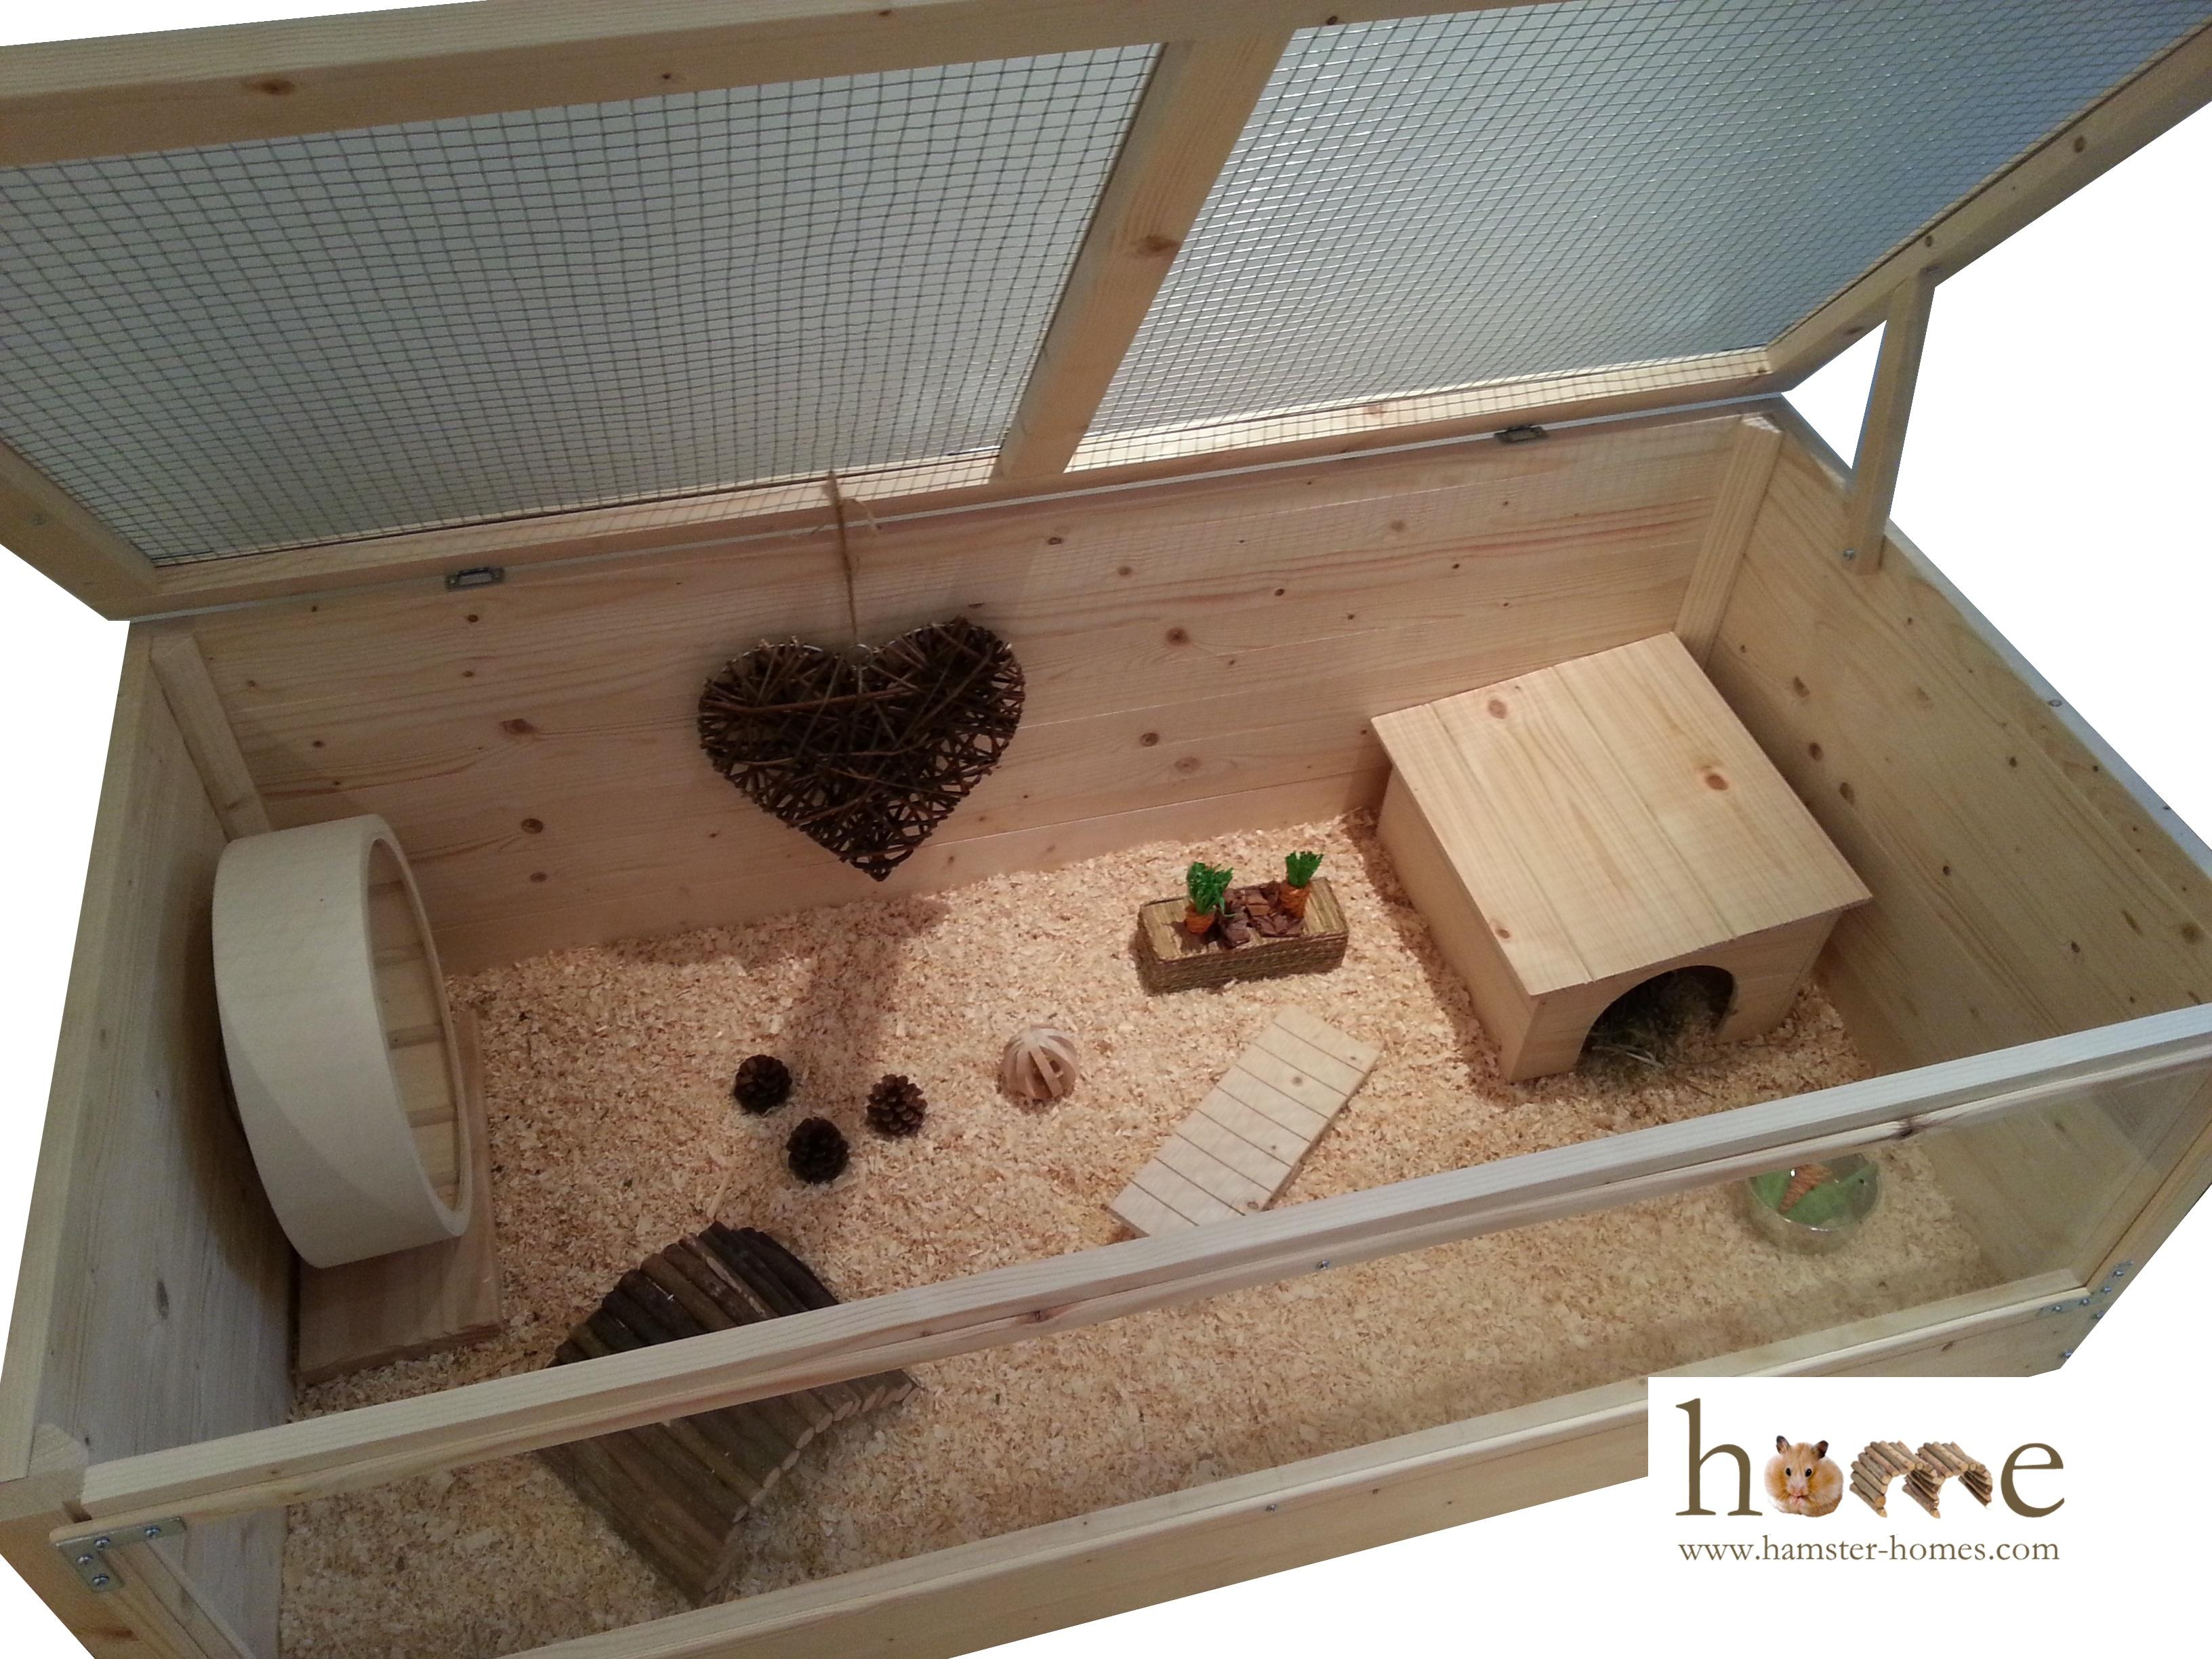 Super Large 120x60cm Hedgehog Cage & Exotic Pet Home